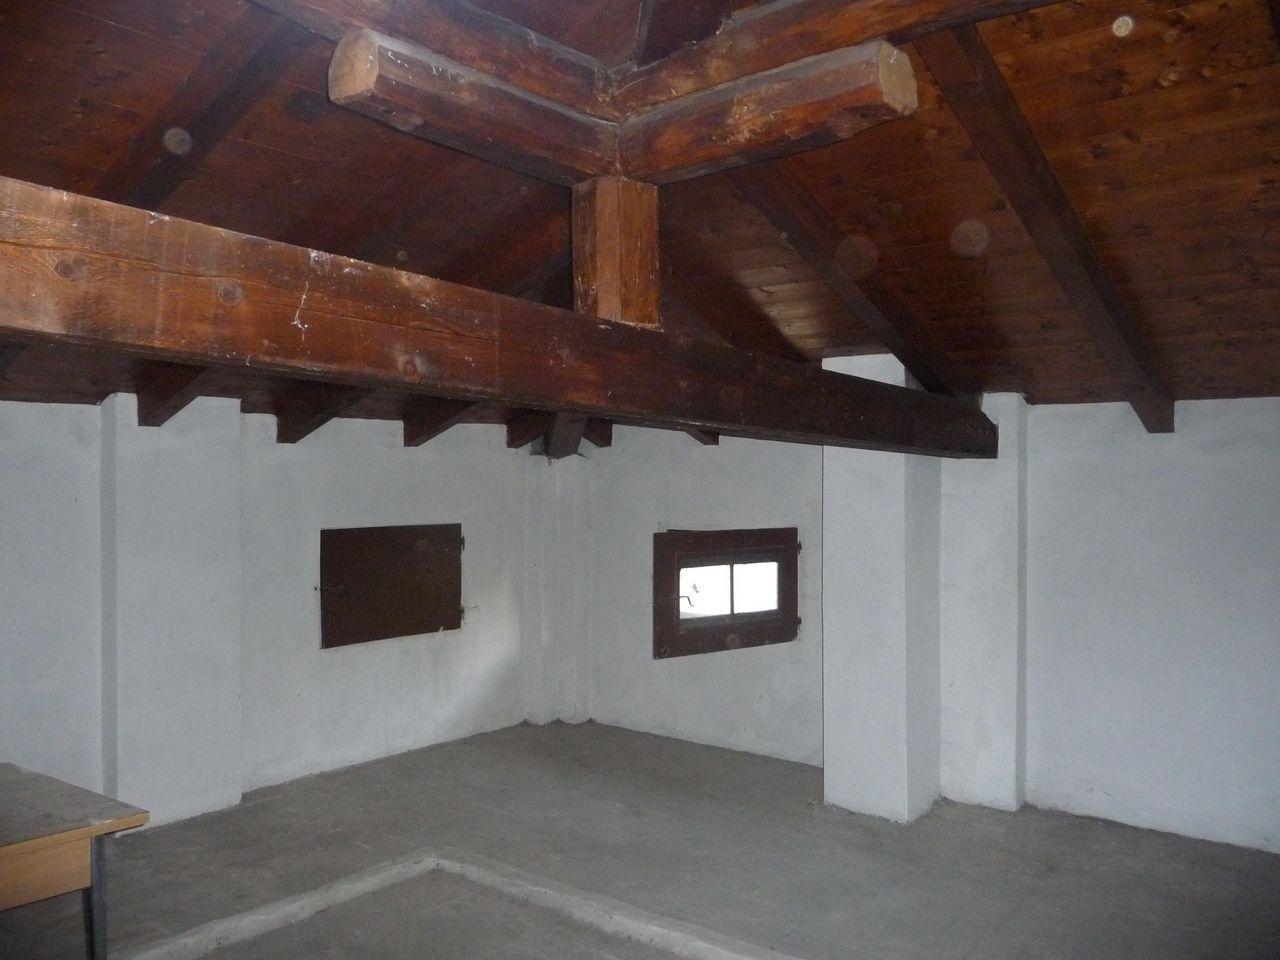 Mansarda - Sottotetto - Soffitta - Solaio, san gabriele, Vendita - Baricella